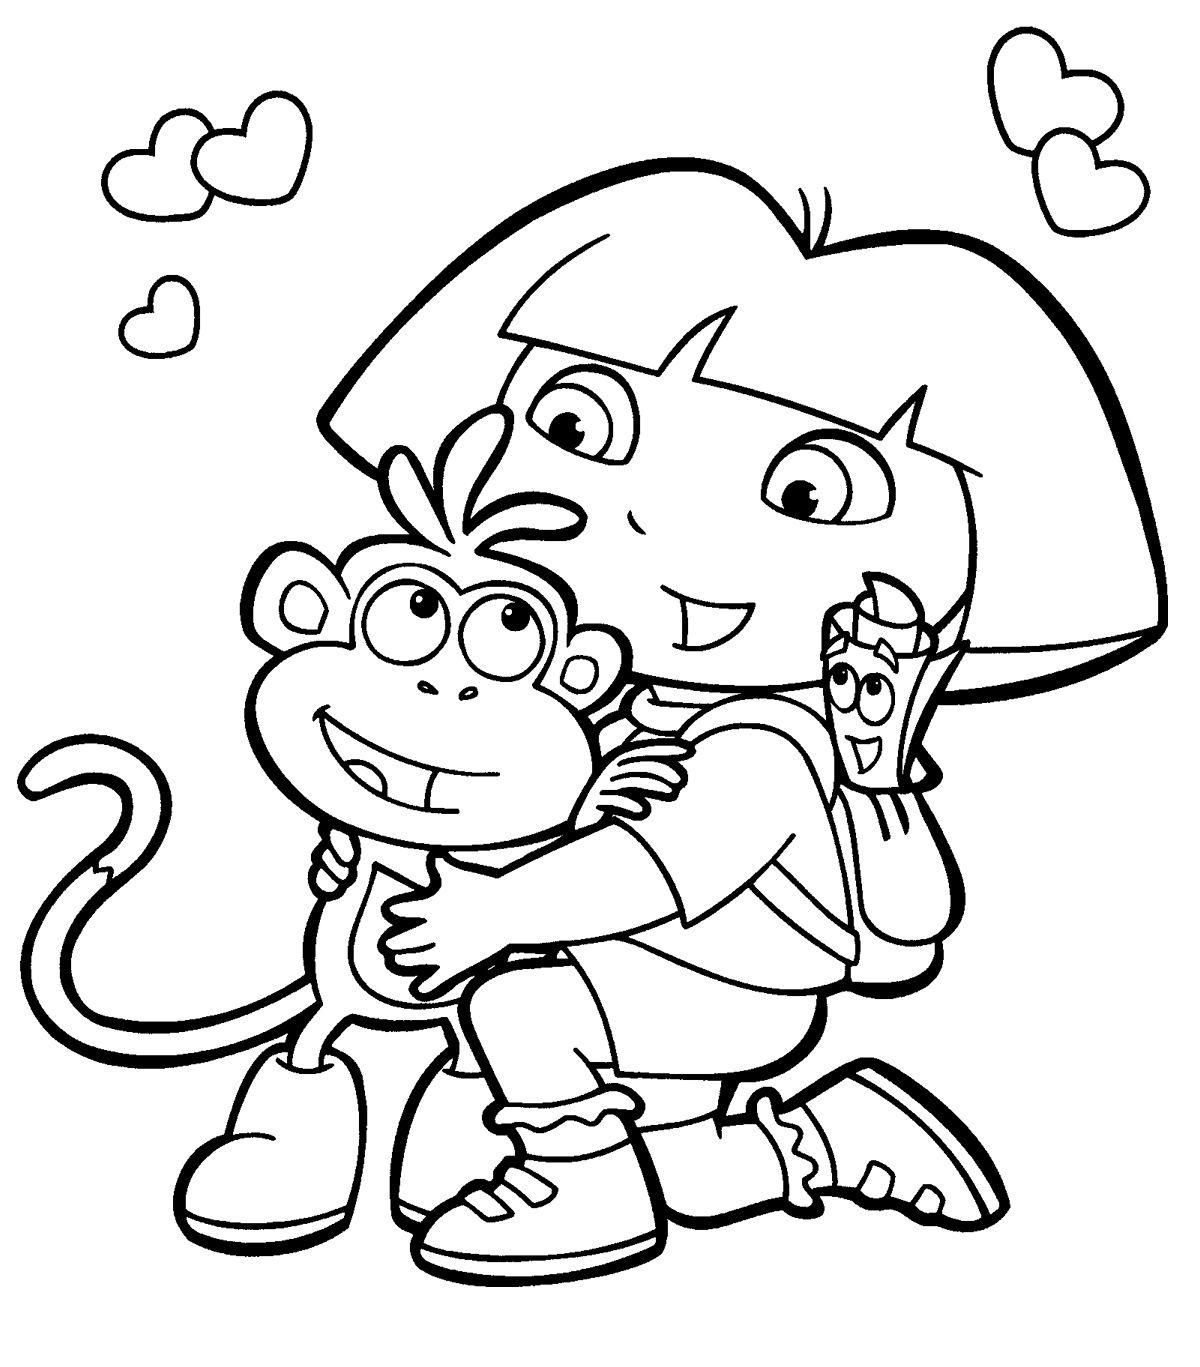 Dora The Explorer Coloring Pages For Kids Dora Coloring